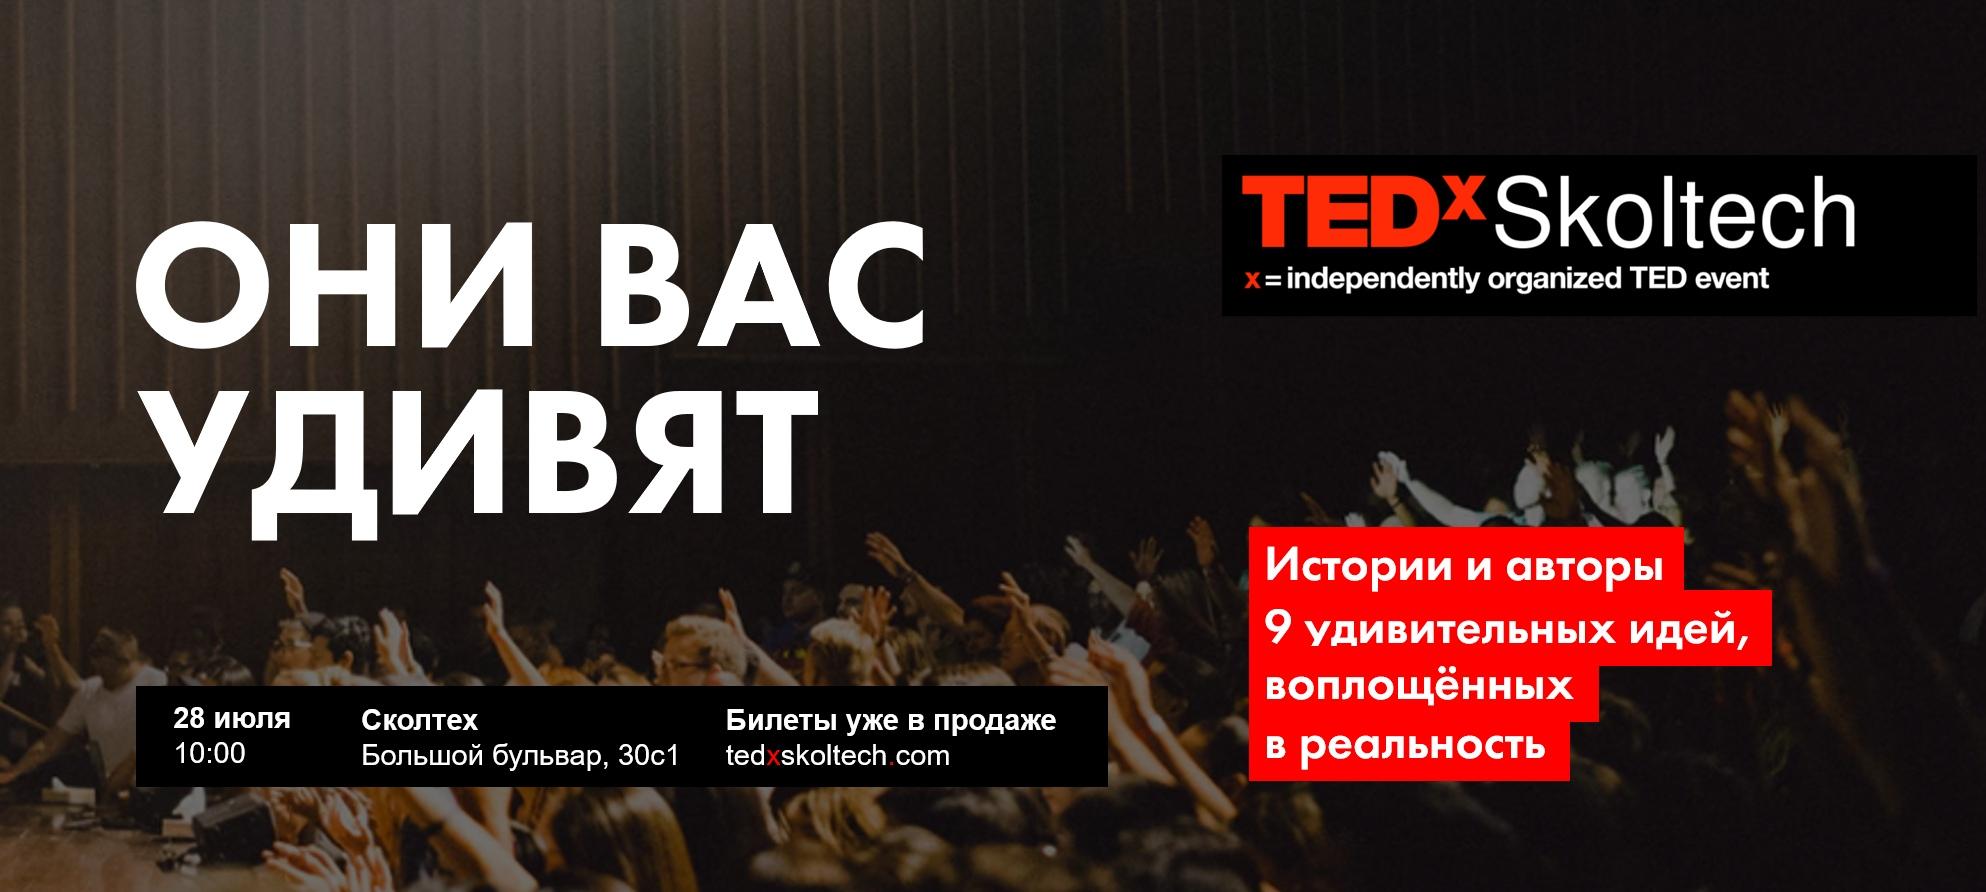 TEDxSkoltech.